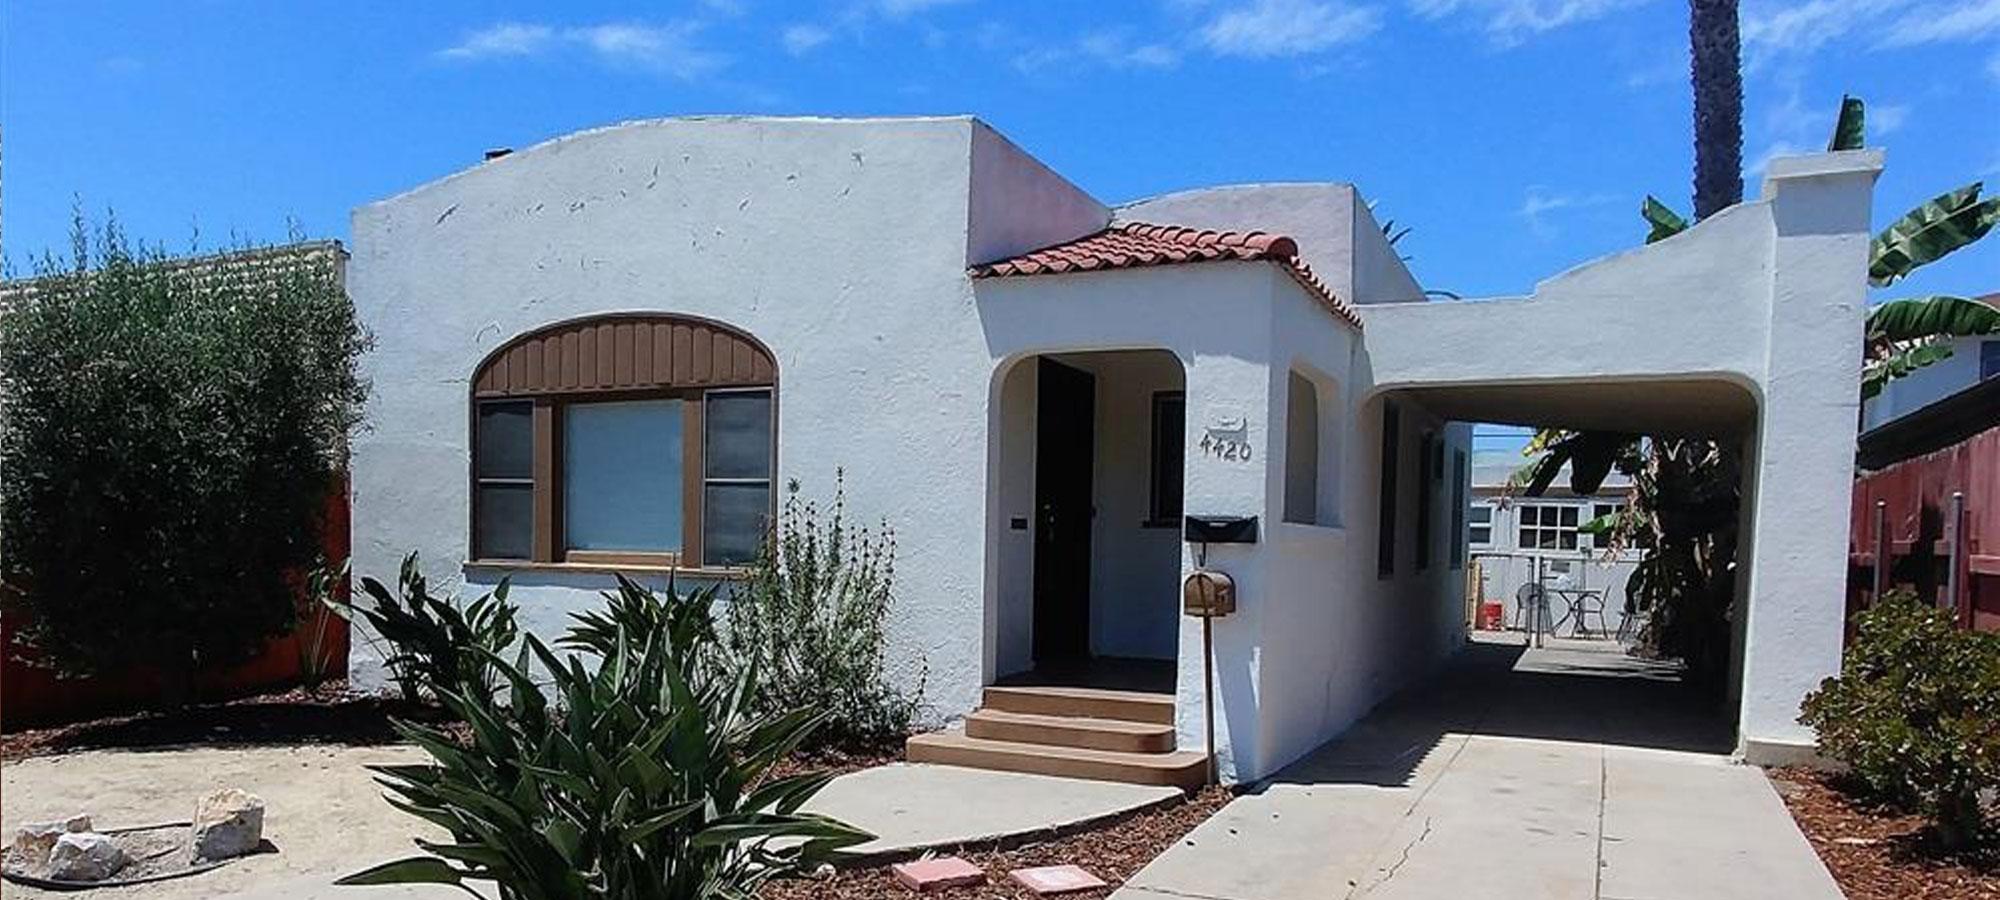 4420 Texas St San Diego, CA 92116